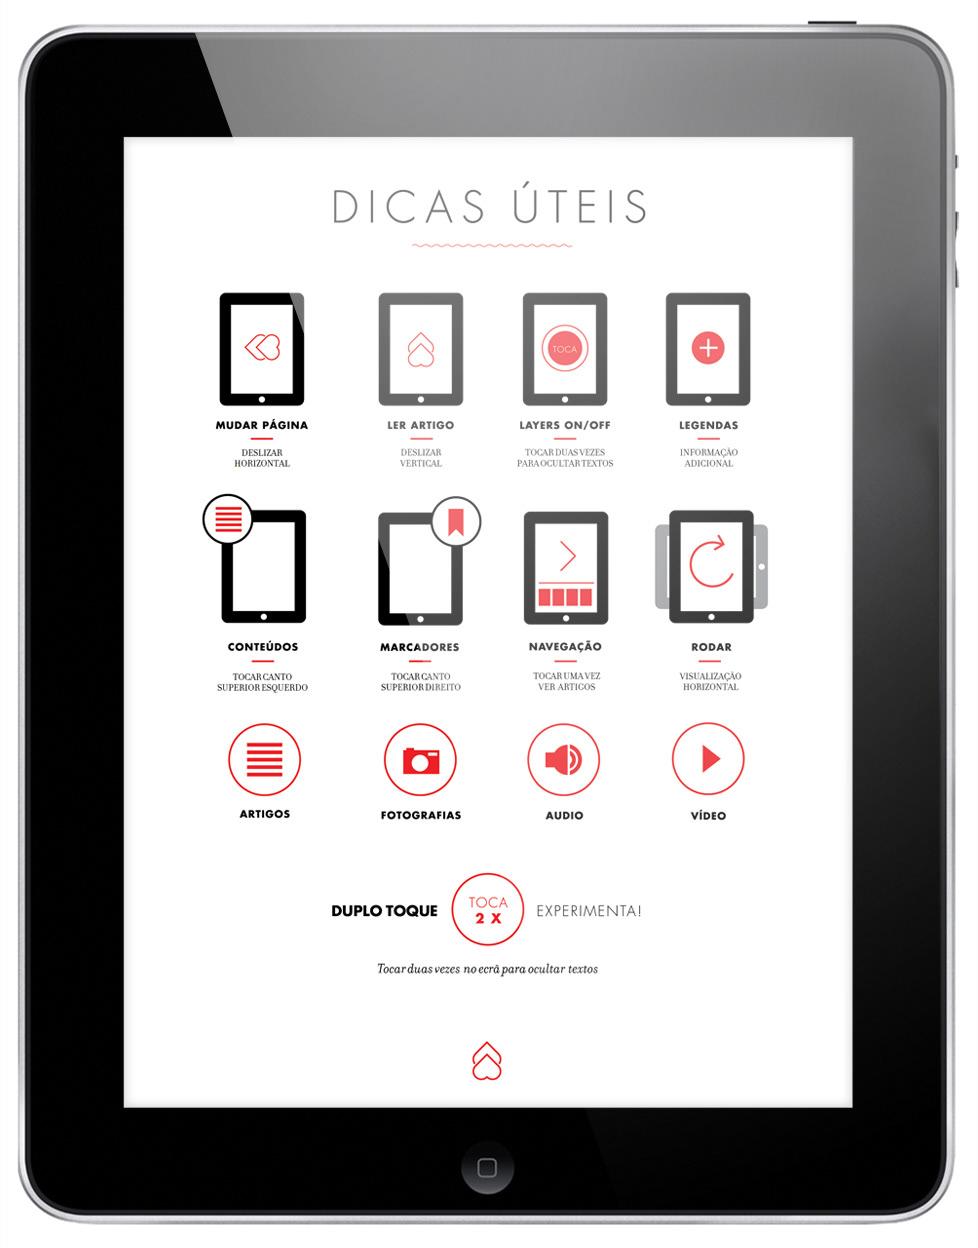 iPad magazine indie viana do castelo ipad editorial ipad revista ipad mag app appstore culture iPad Magazine iPad Portugal